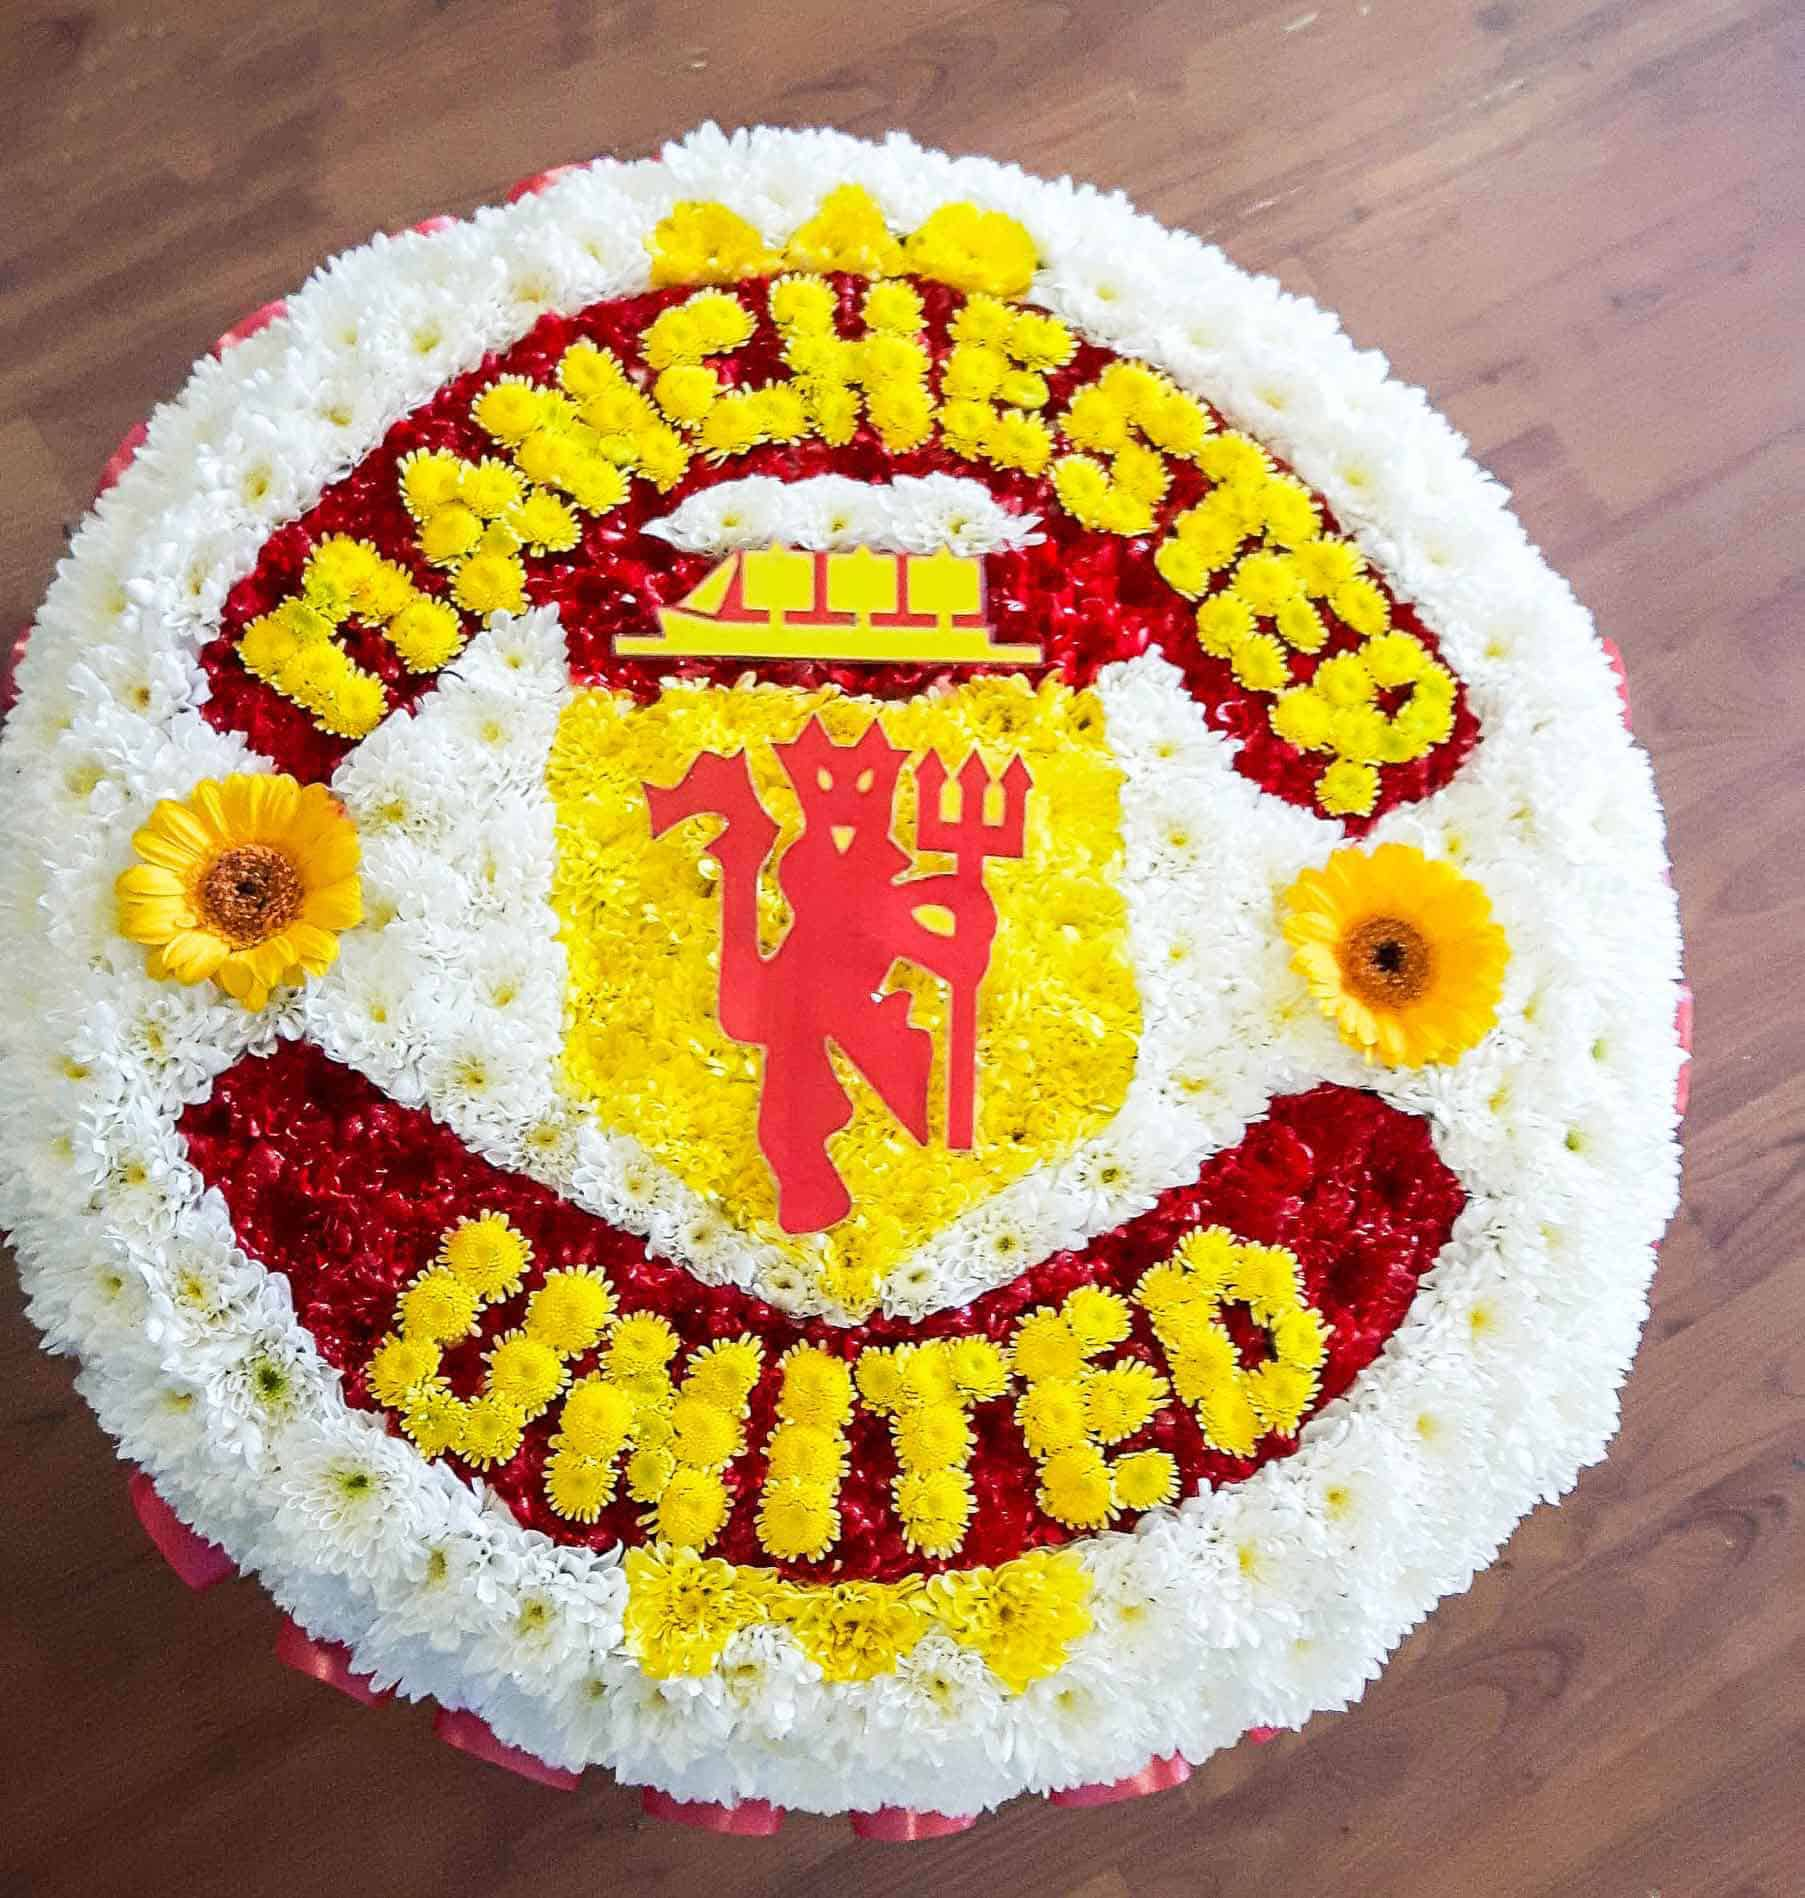 Rosebuds_flowers_torquay_manchester_united